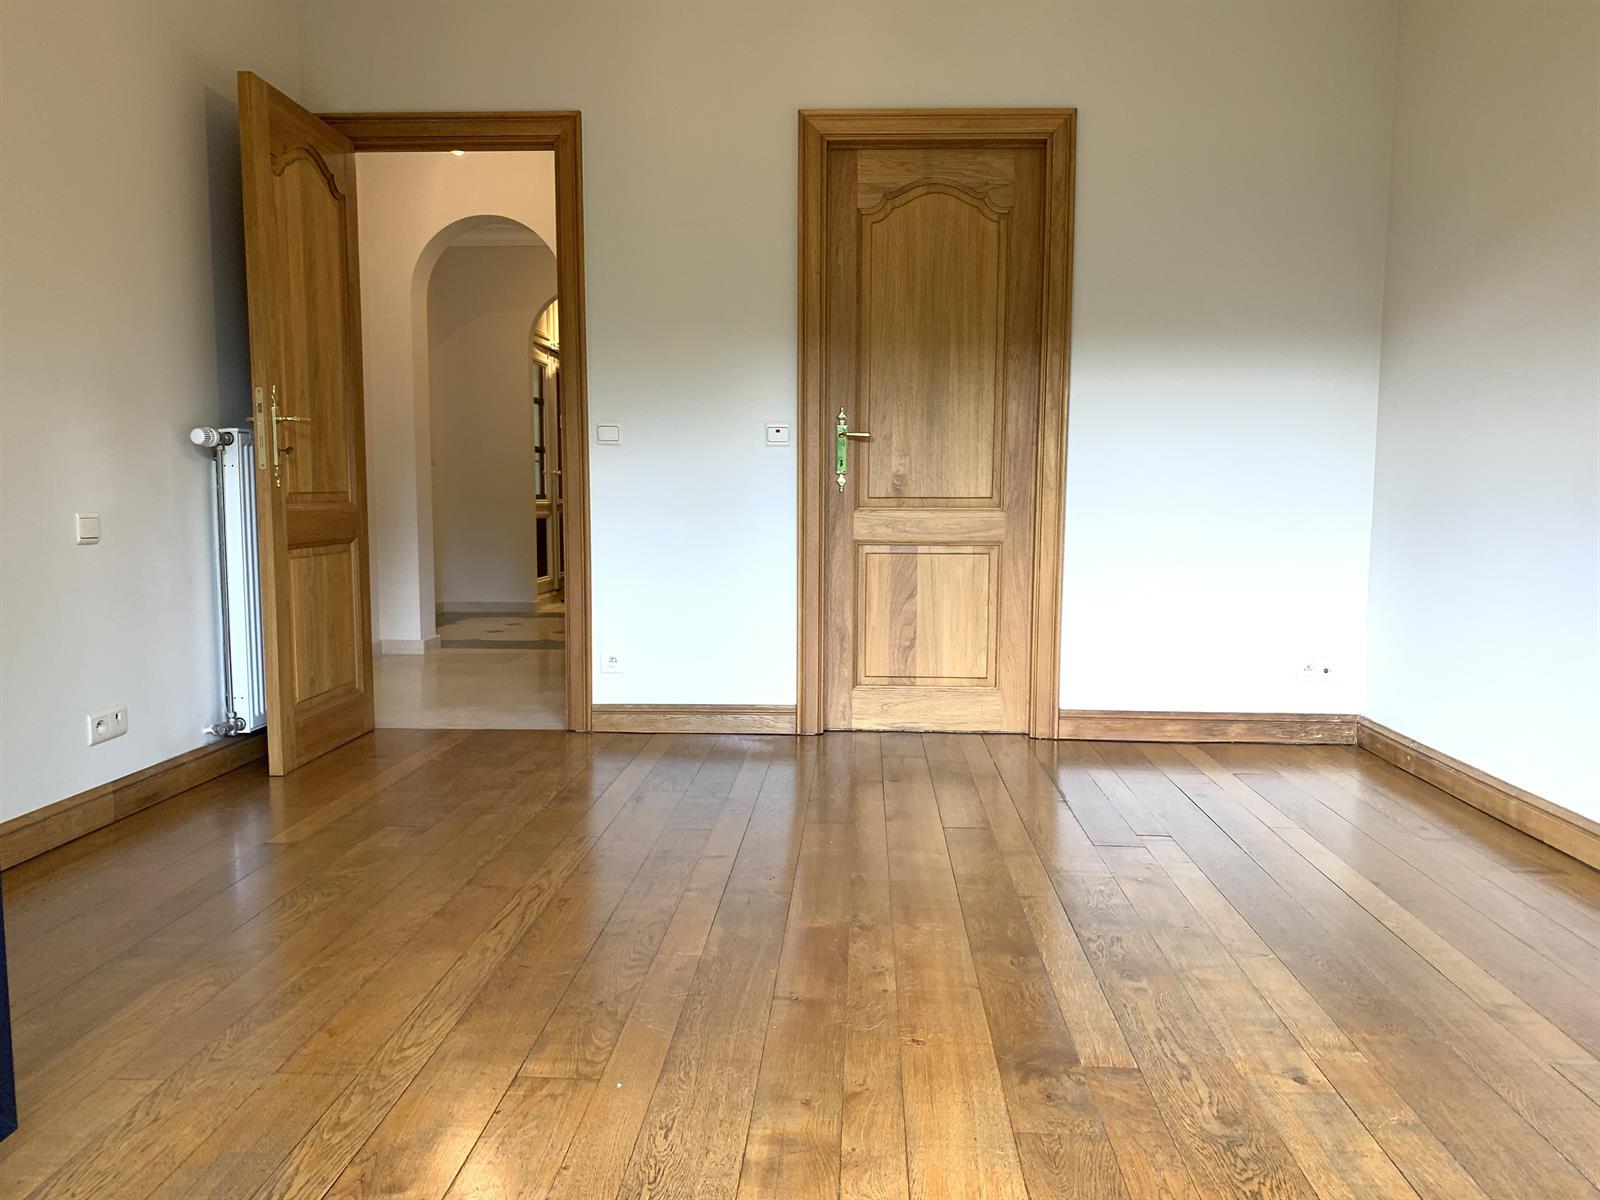 Appartement exceptionnel - Woluwe-Saint-Pierre - #4433539-28